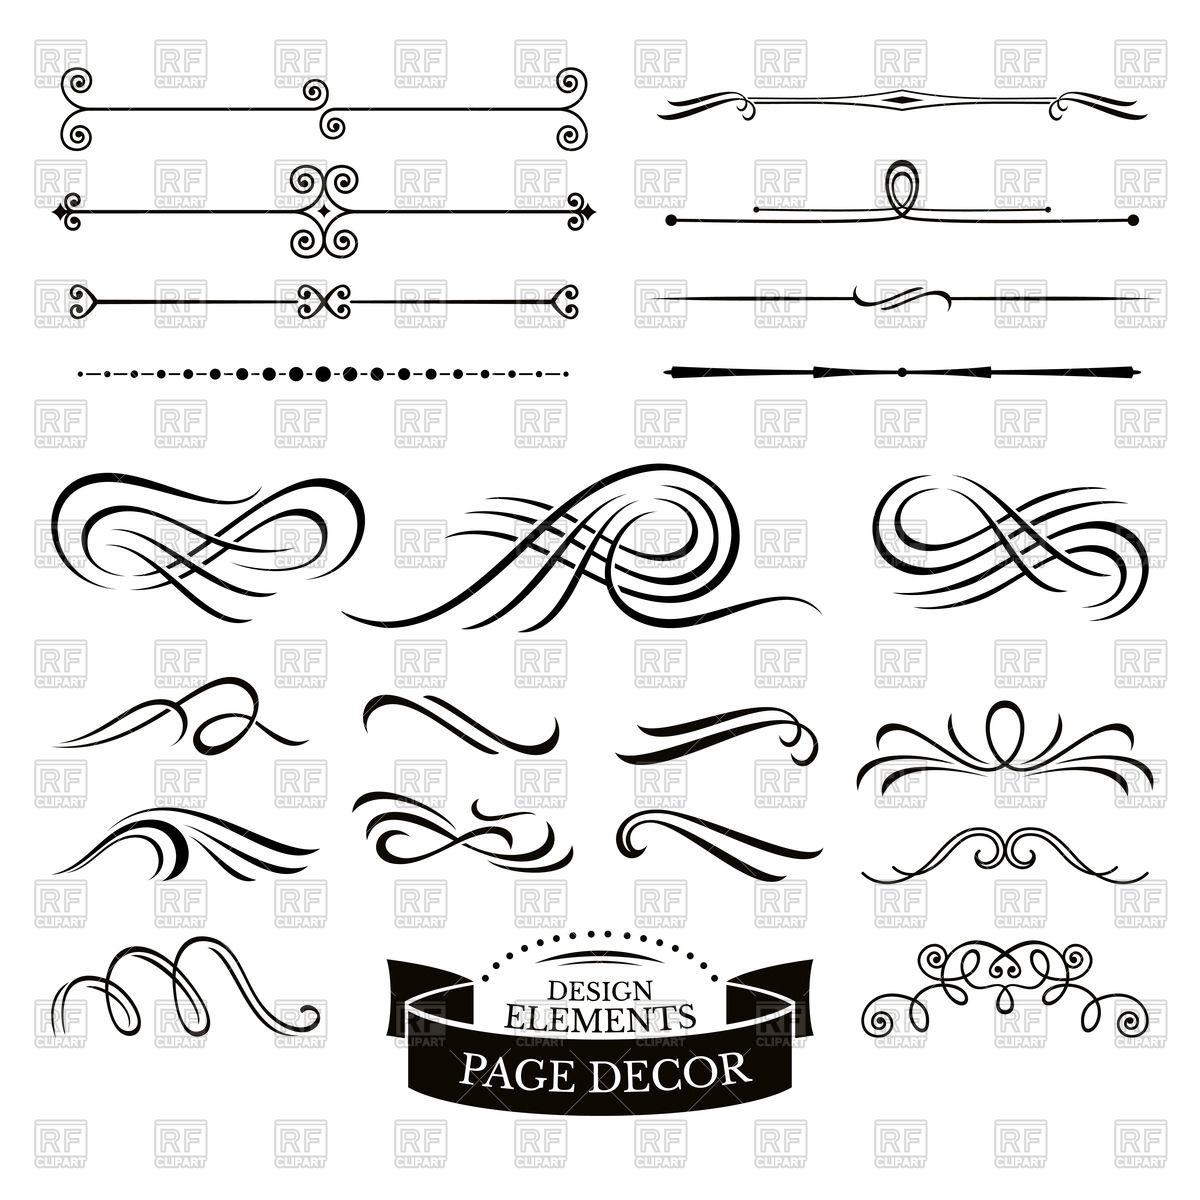 1200x1200 Calligraphic Design Elements